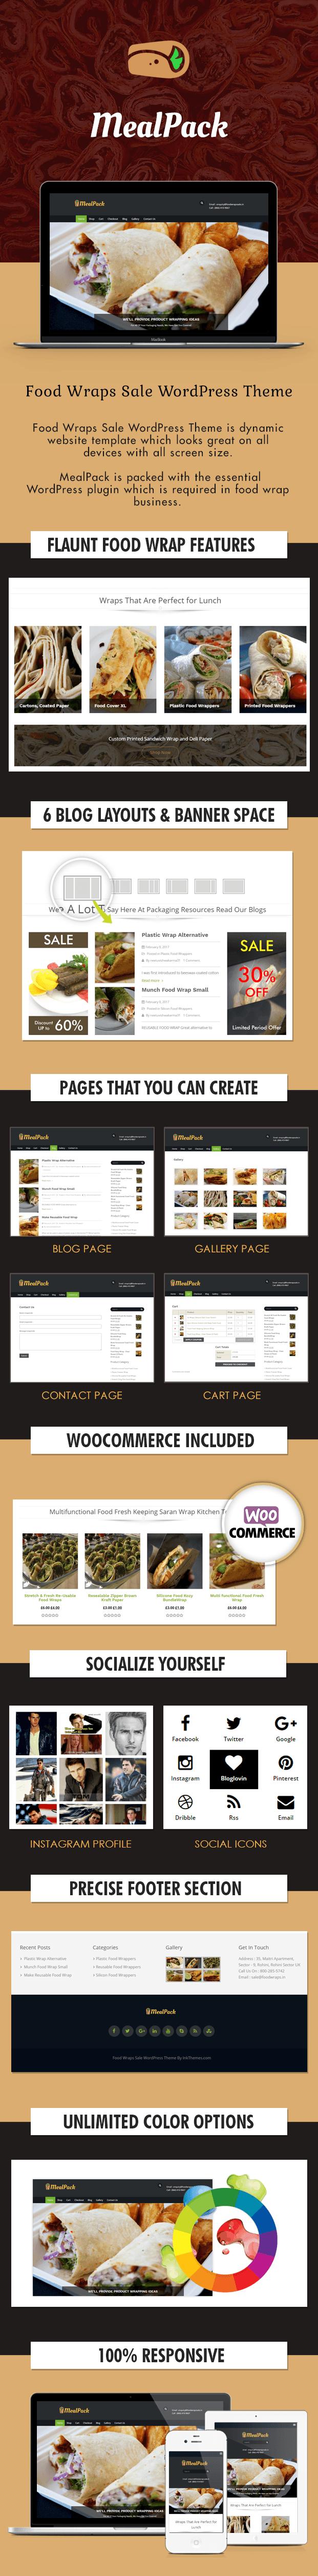 Food Wraps Sale WordPress Theme Sales